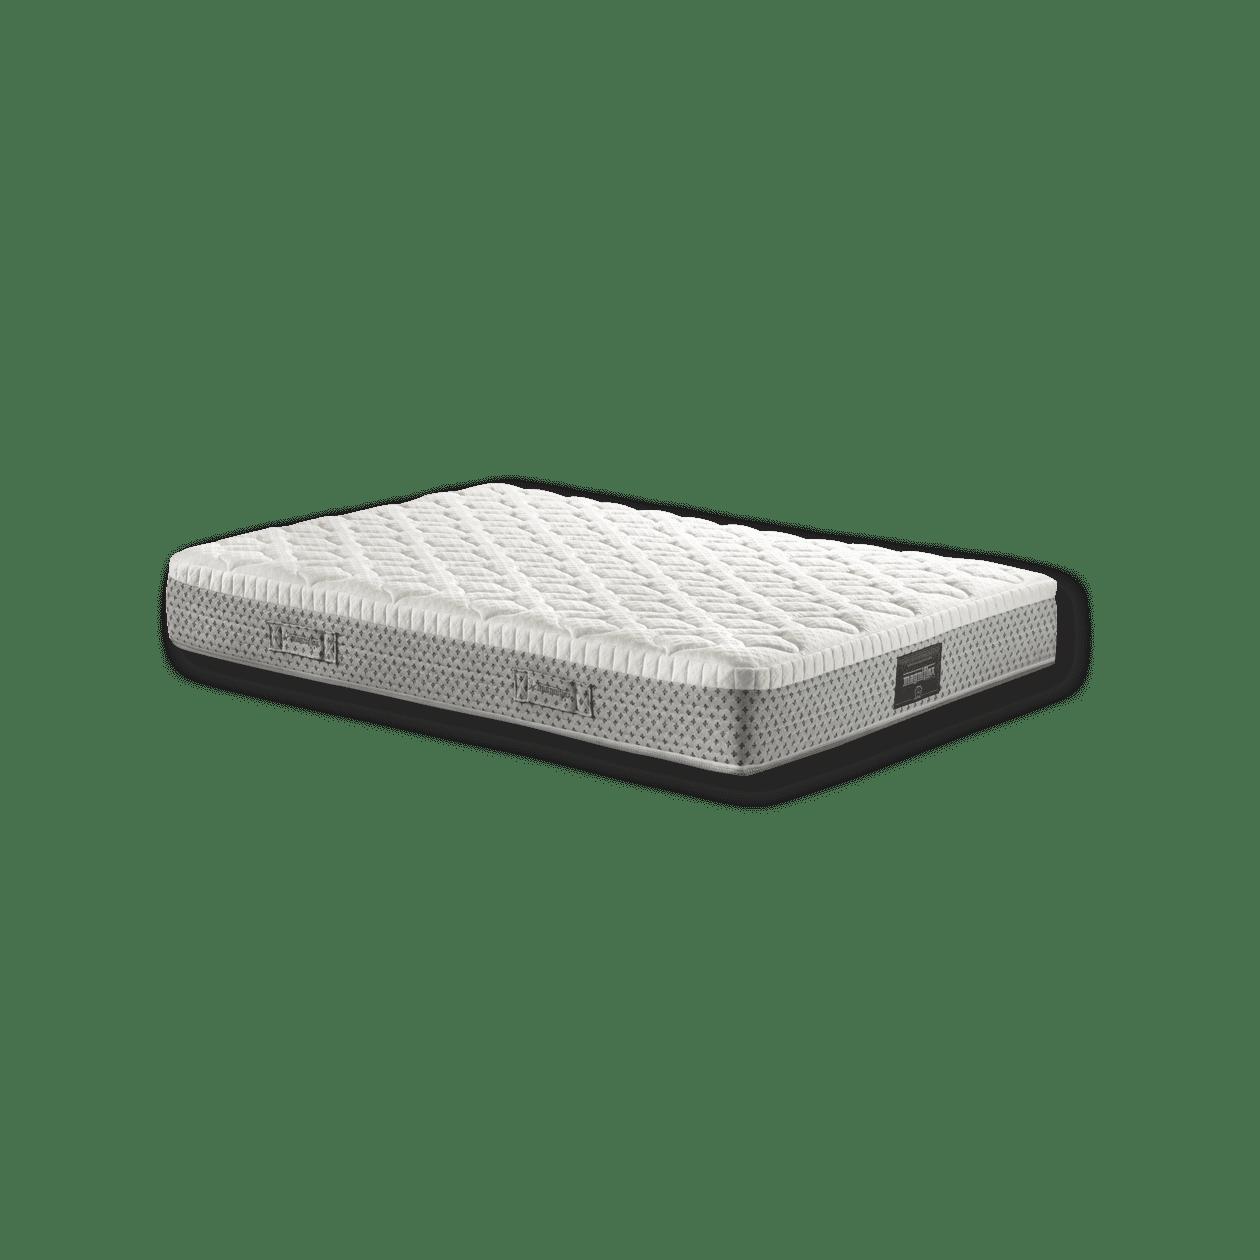 Луксозен матрак Magniflex – Comfort Dual Memory Foam HD® ,Elioform®,Dual Core®,Outlast®